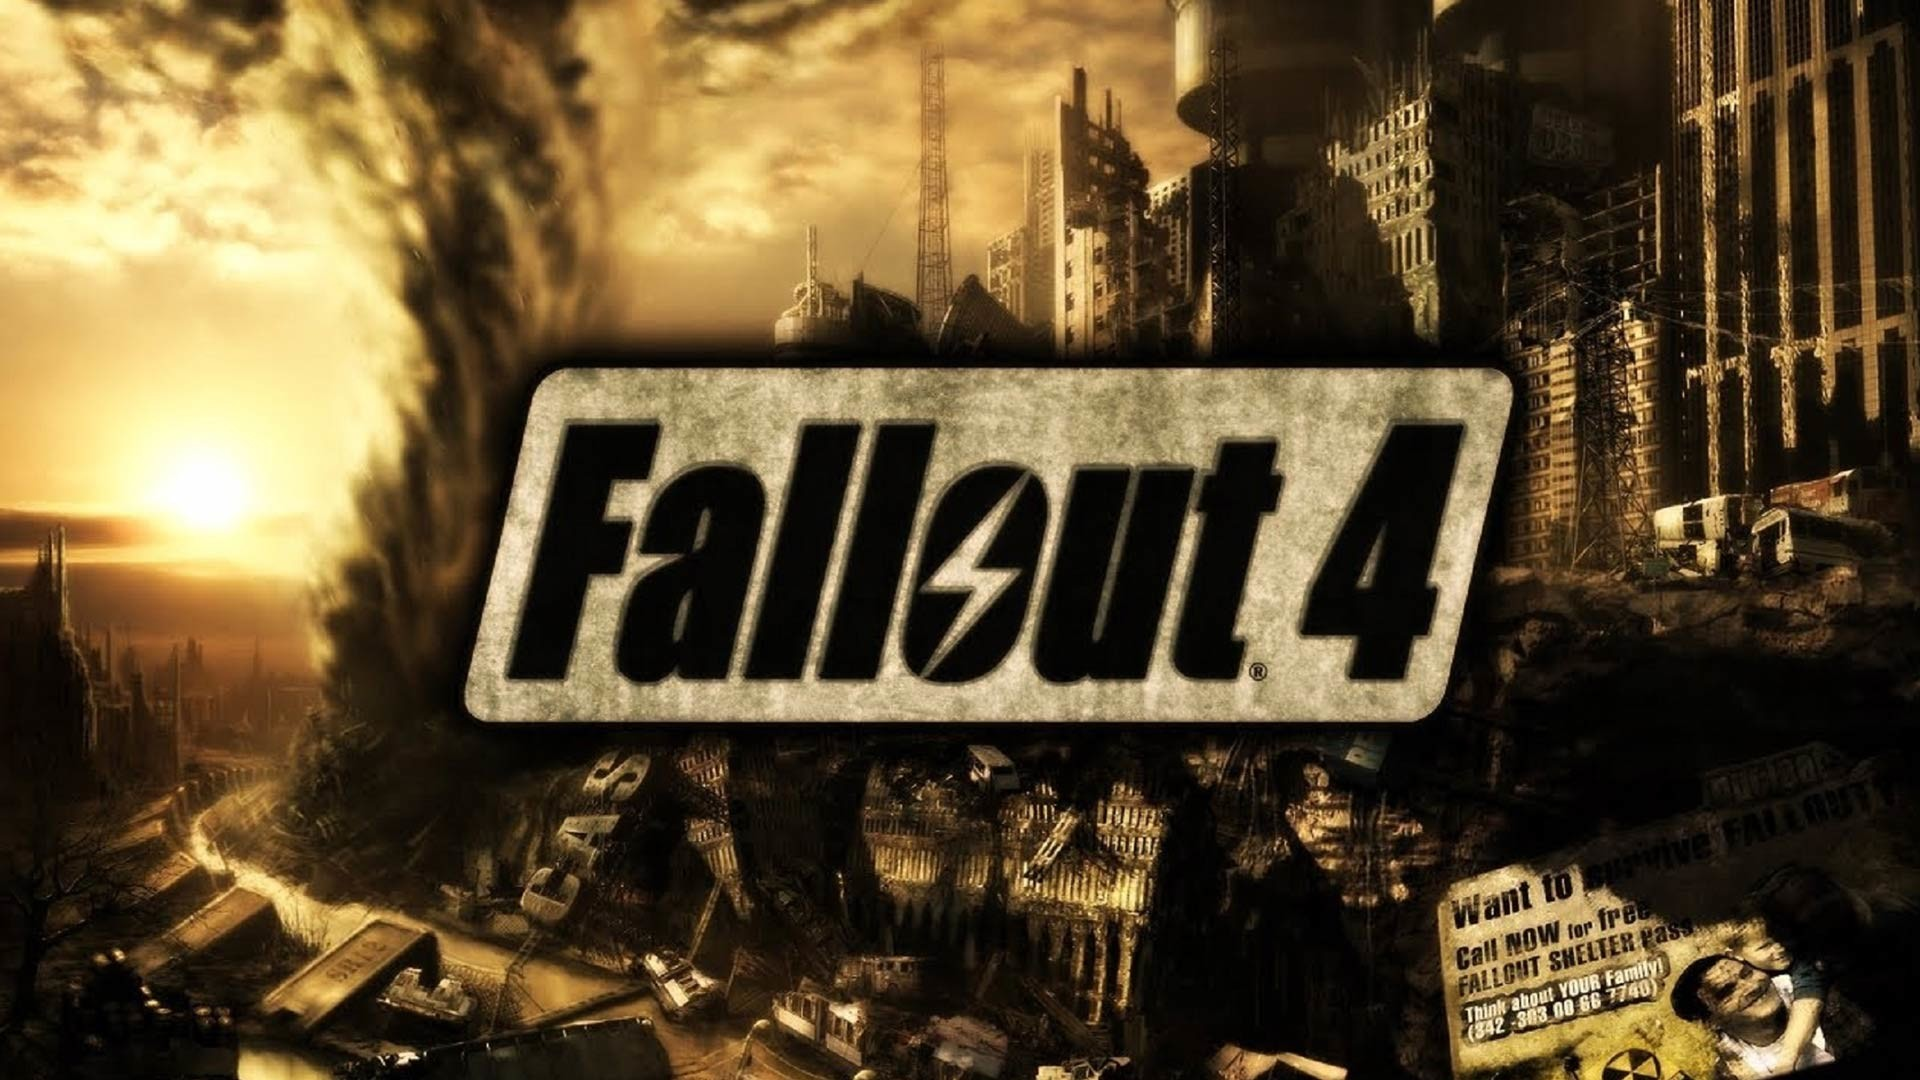 Fallout 4 Wallpaper – wallpaper.